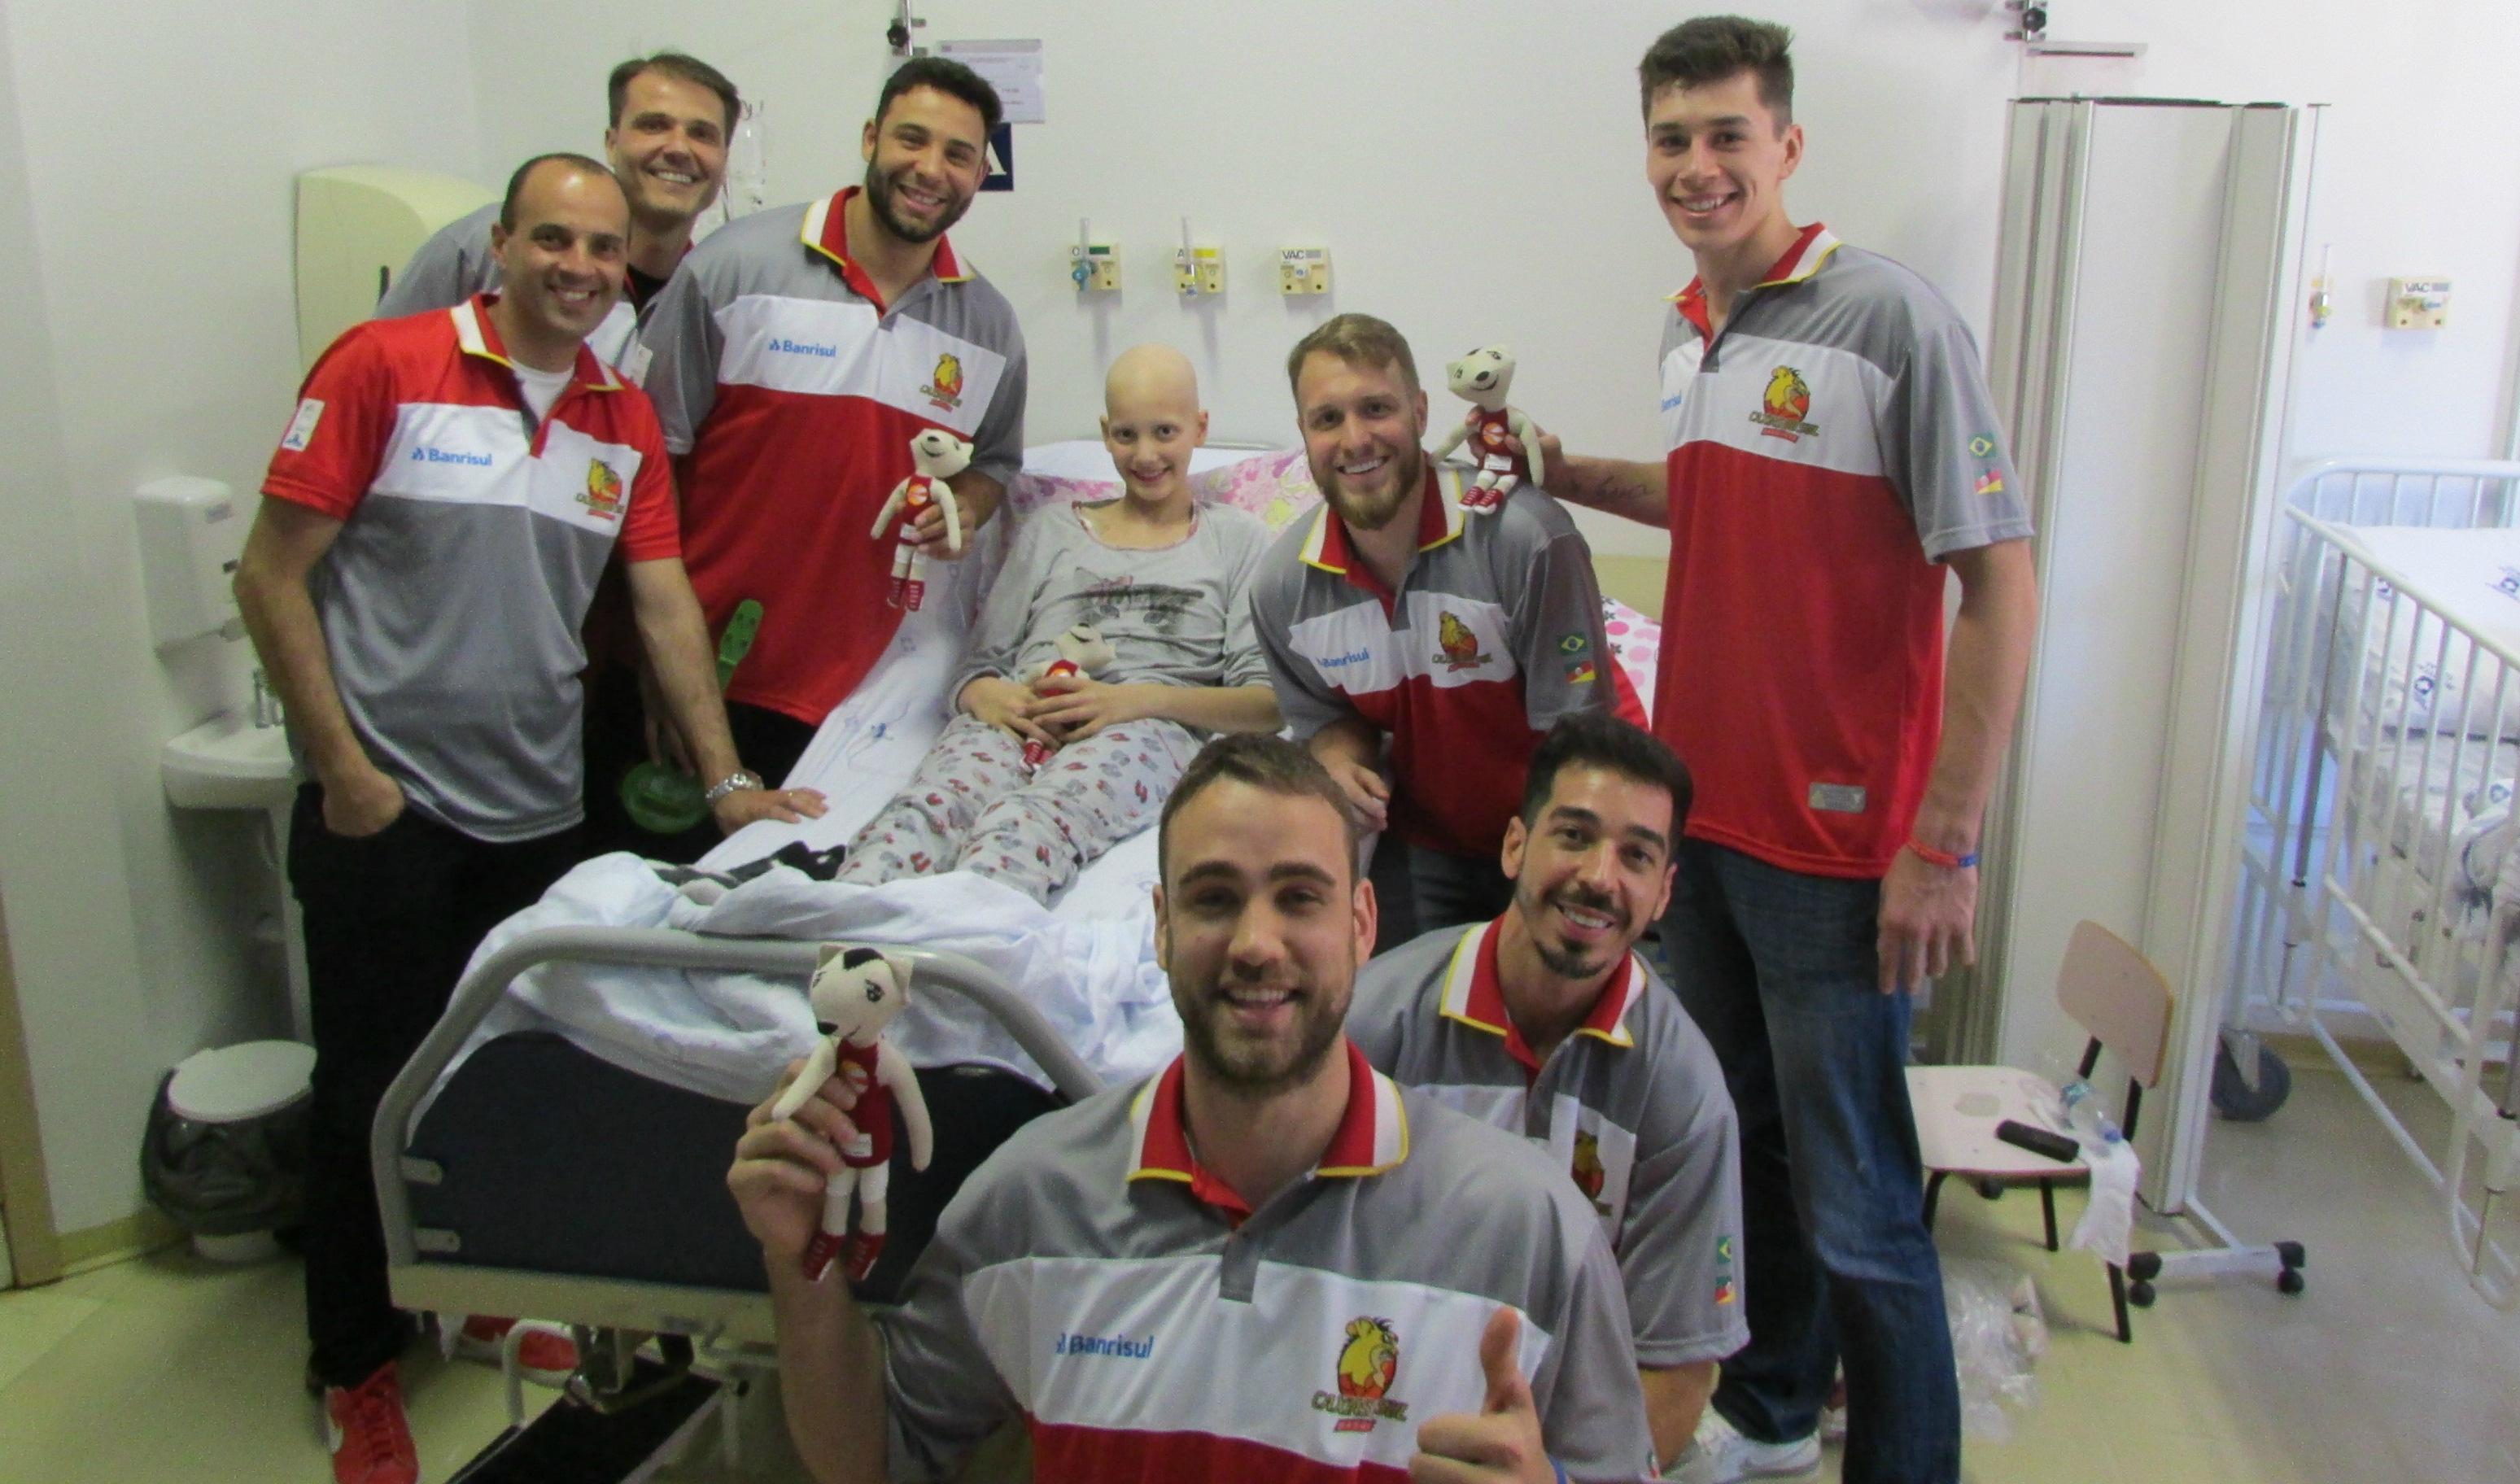 Visita do Caxias ao Hospital Geral